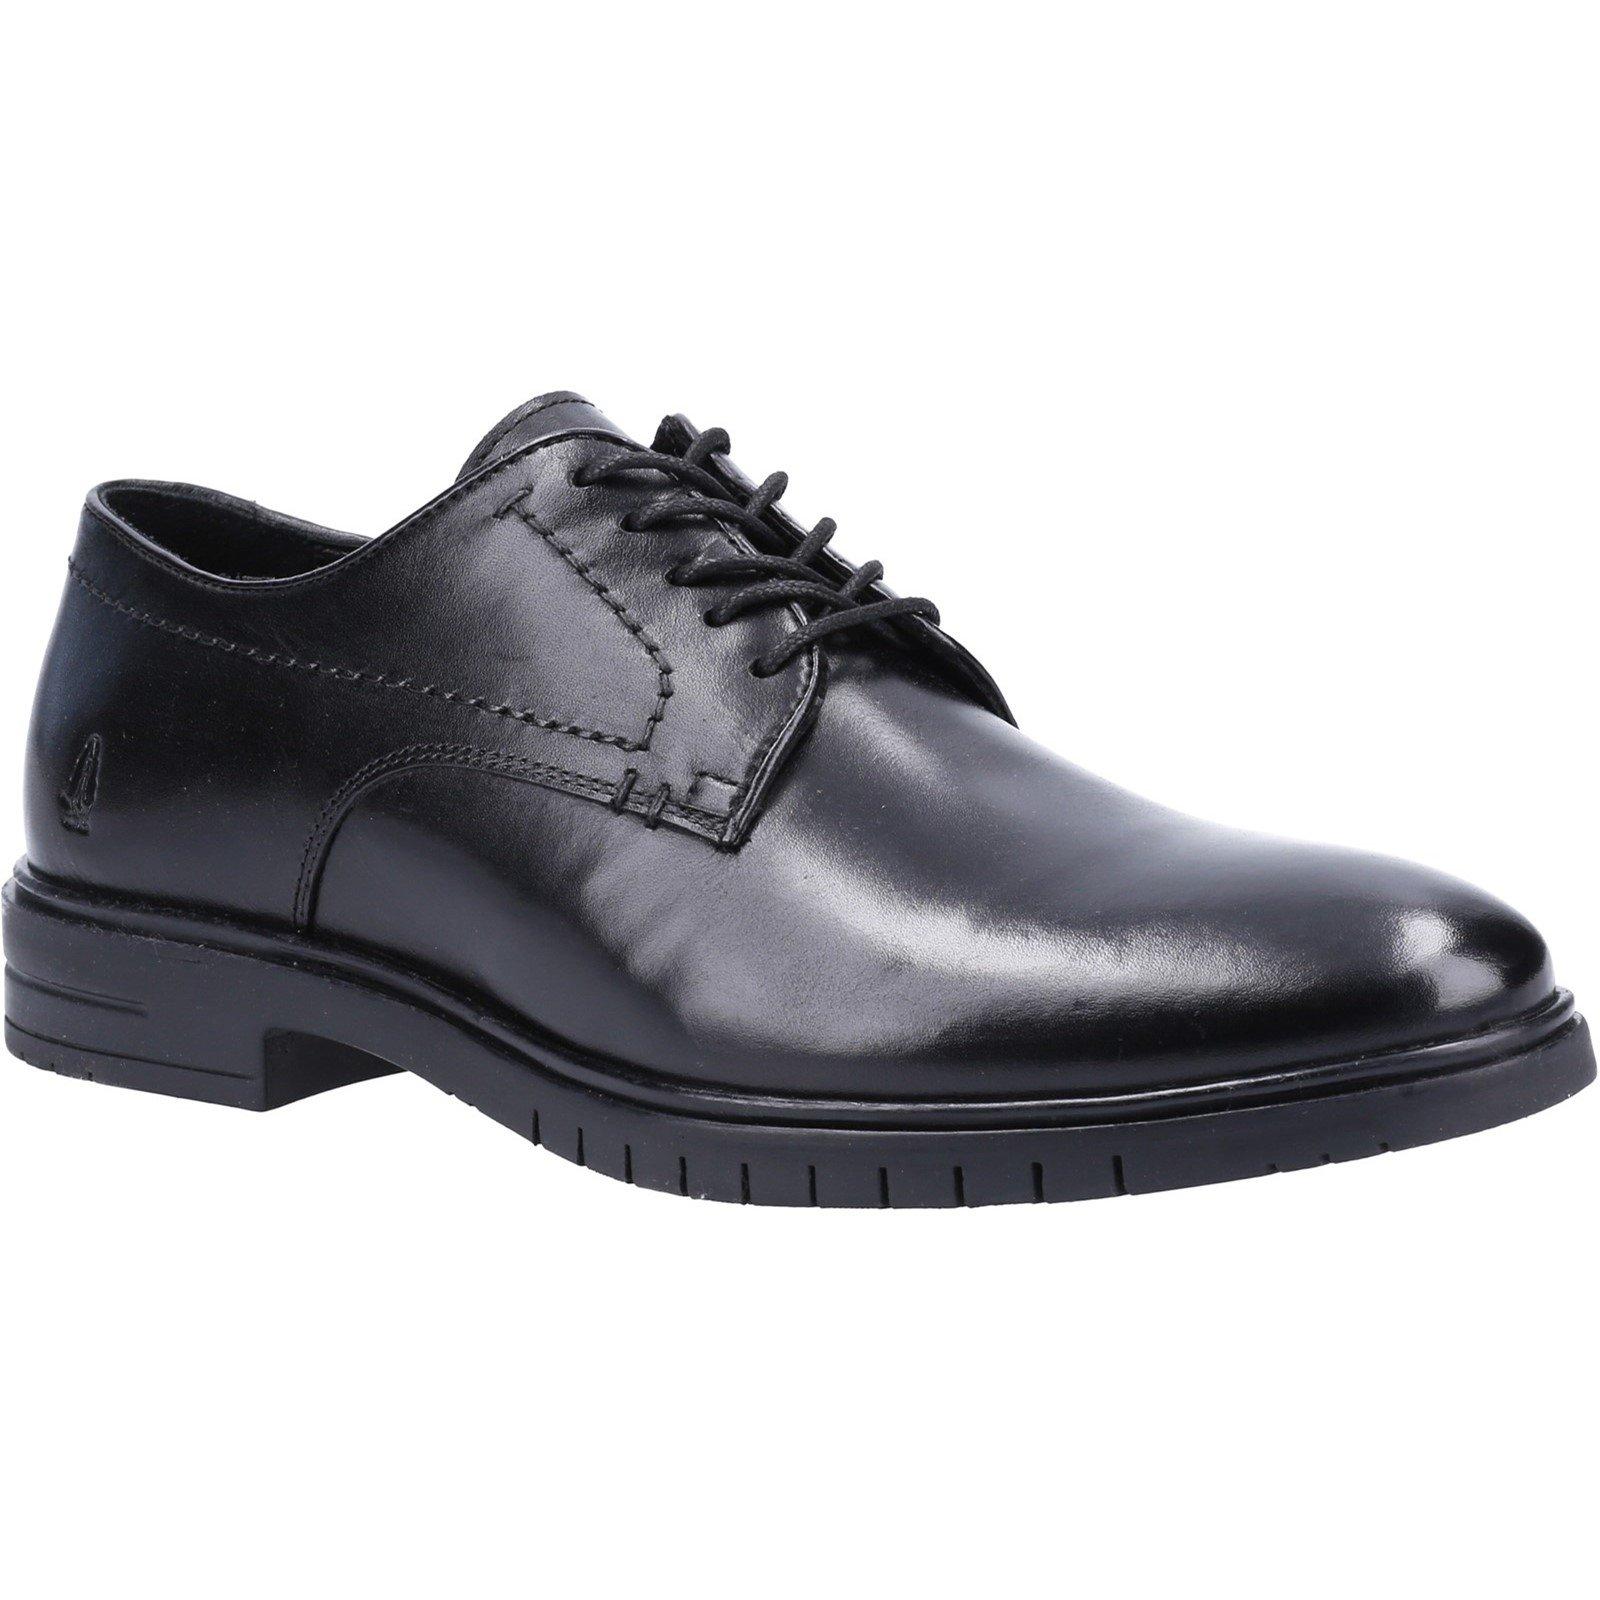 Hush Puppies Men's Sterling Lace Derby Shoe Black 31992 - Black 11